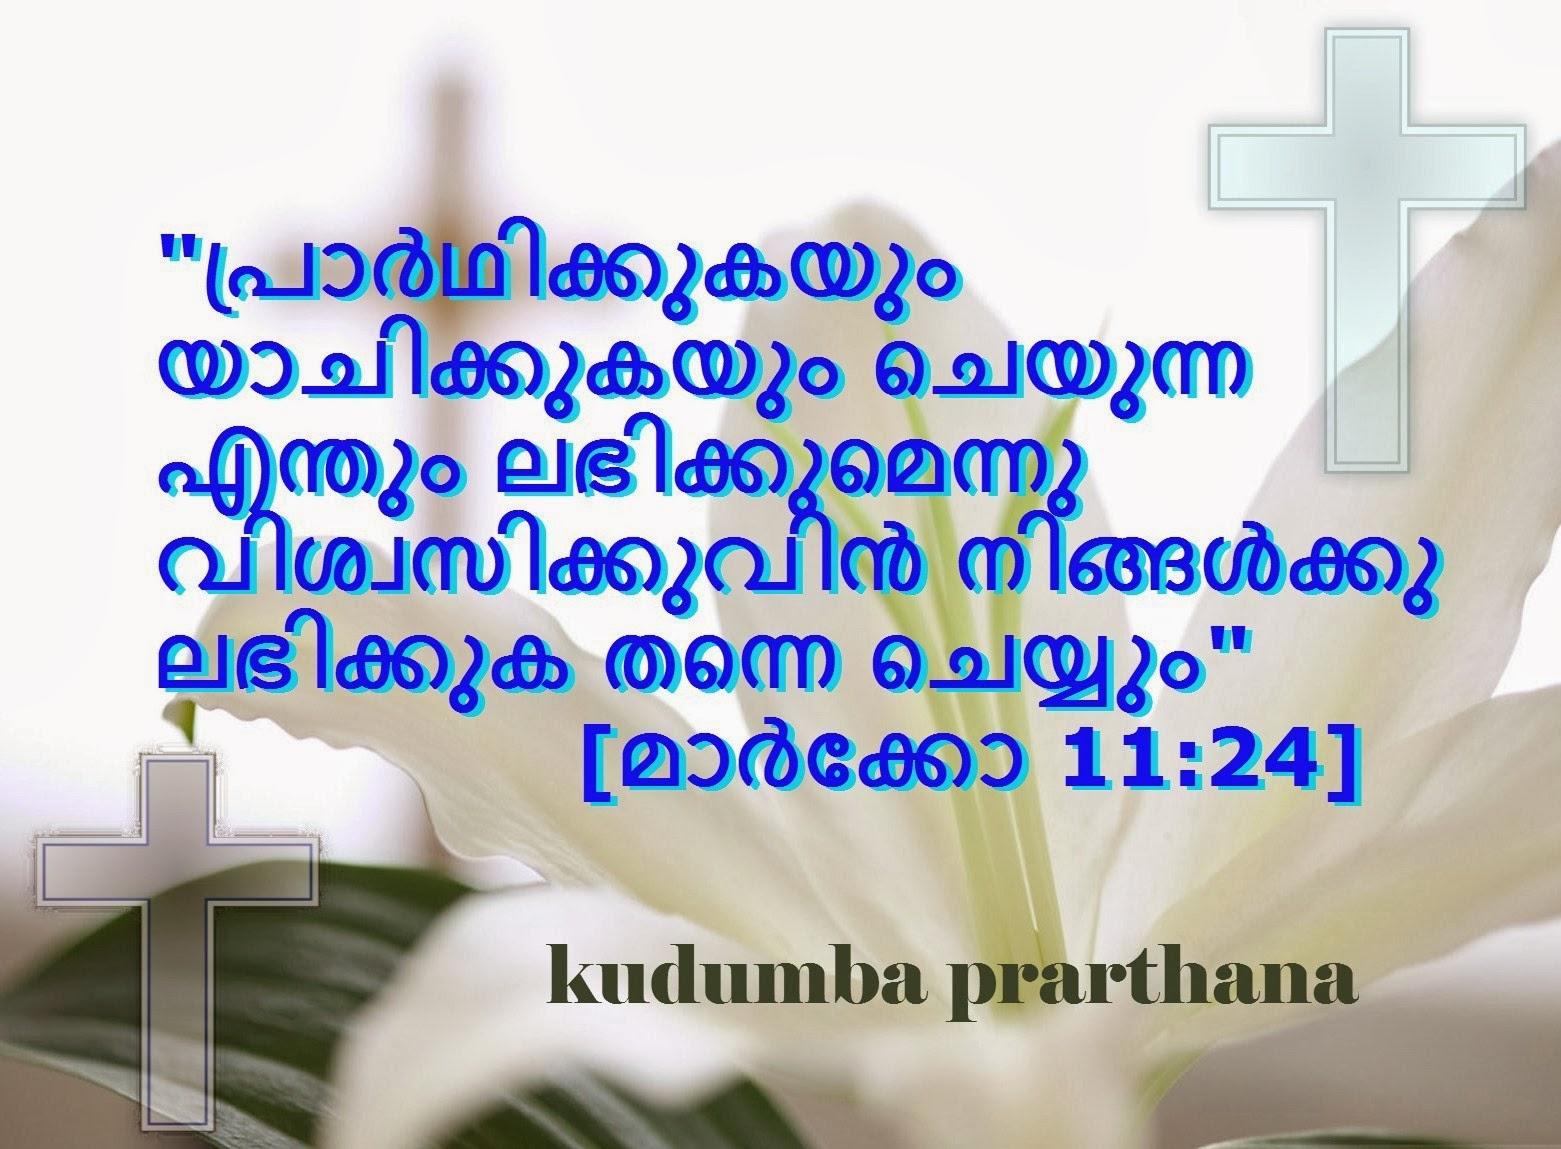 Sorrow Wallpapers With Quotes Kudumba Prarthana Malayalam Prayers Bible Verses Malayalam